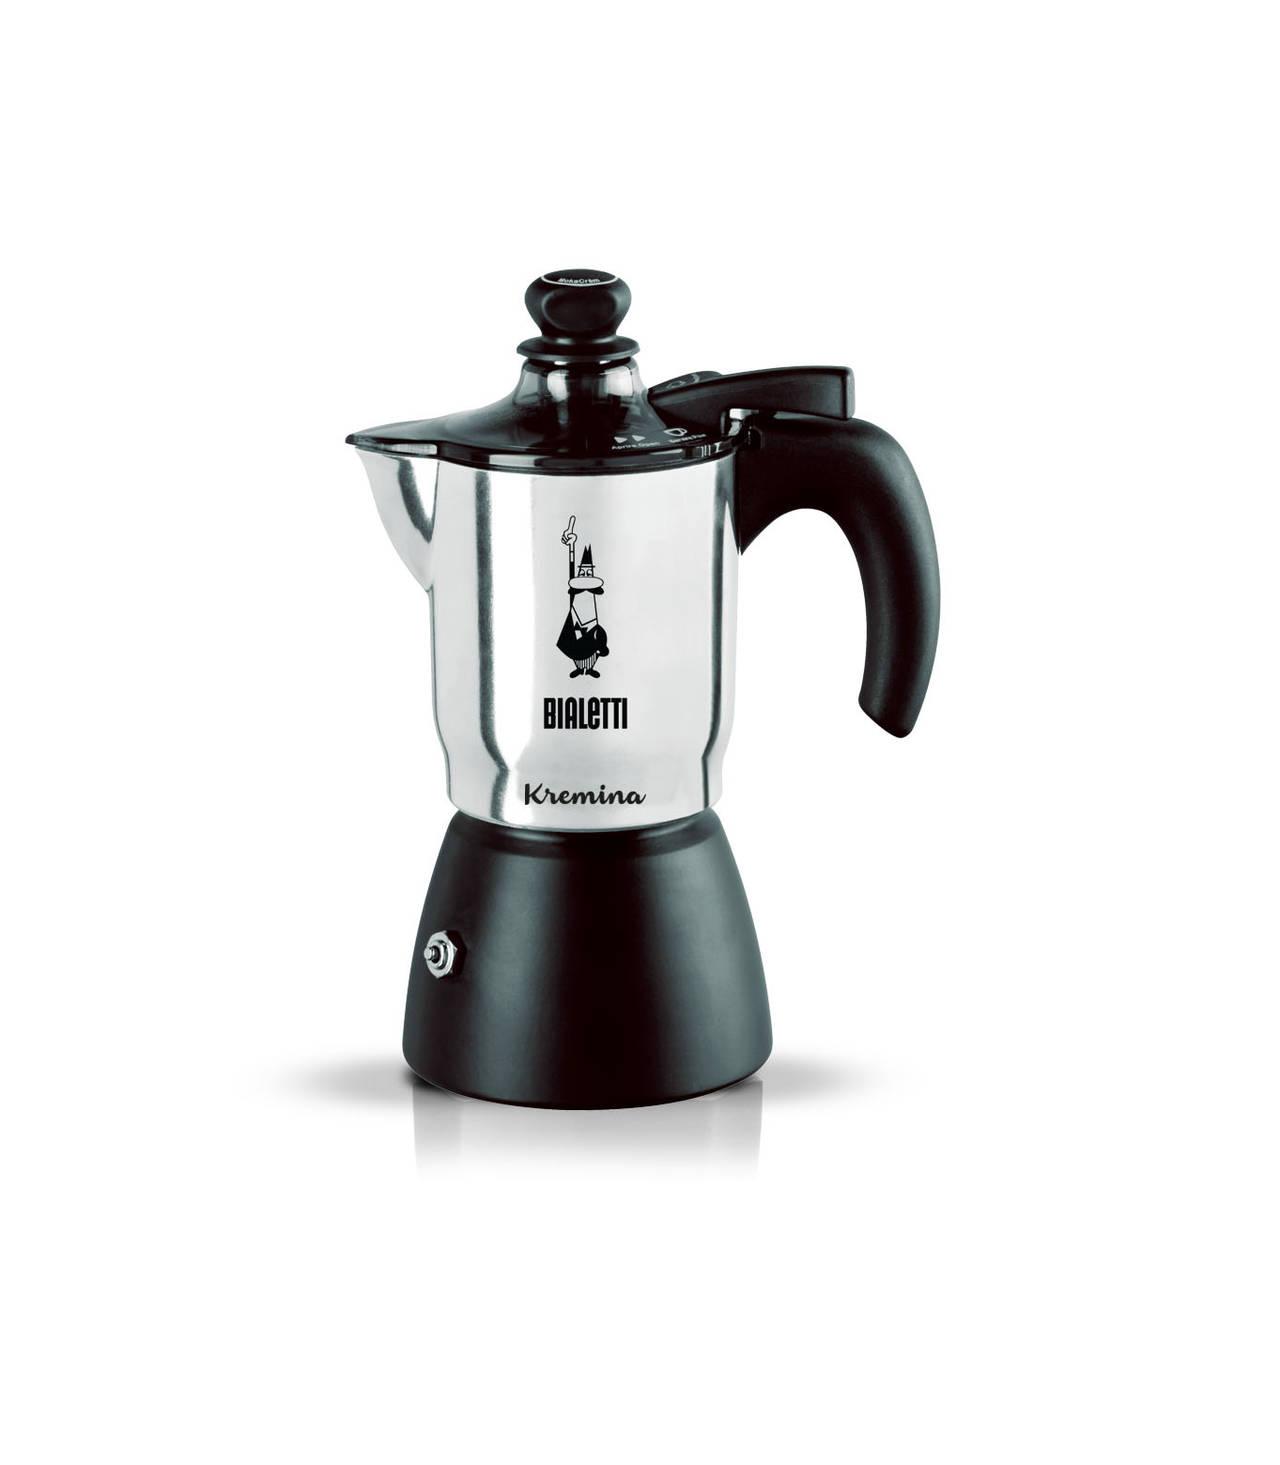 Bialetti หม้อต้ม กาแฟสด รุ่น Kremina ขนาด 3 cups